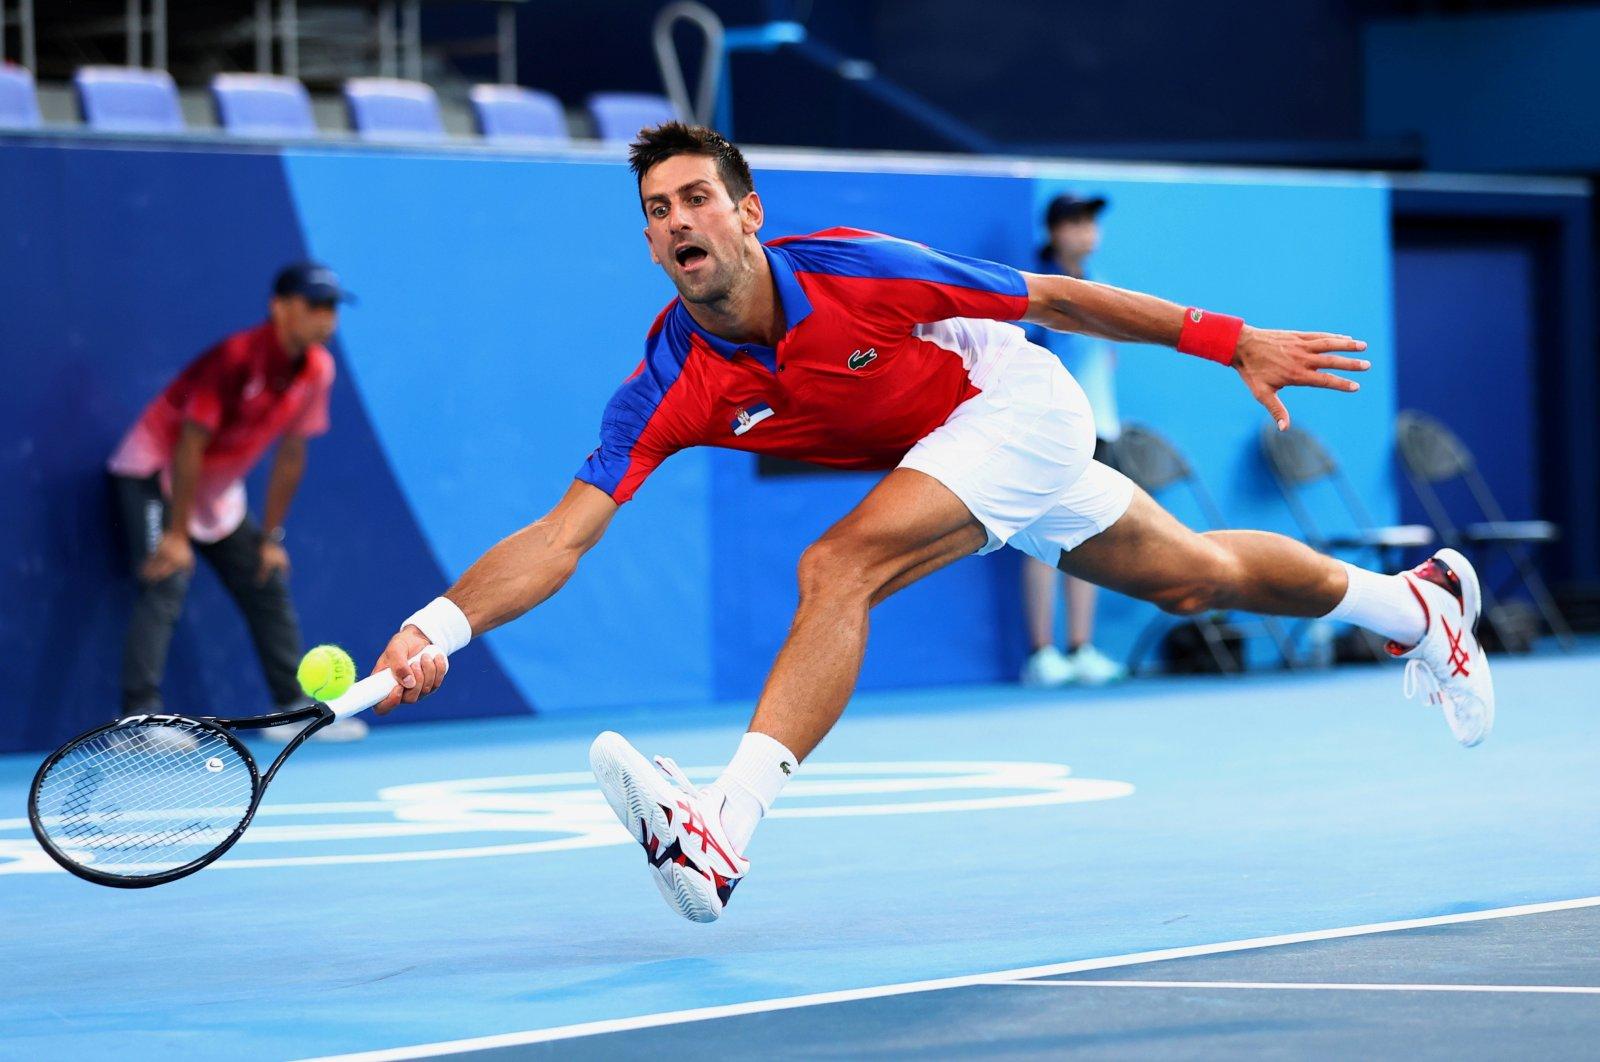 Serbia's Novak Djokovic in action during his Tokyo 2020 bronze medal match against Spain's Pablo Carreno, Tokyo, Japan, July 31, 2021.